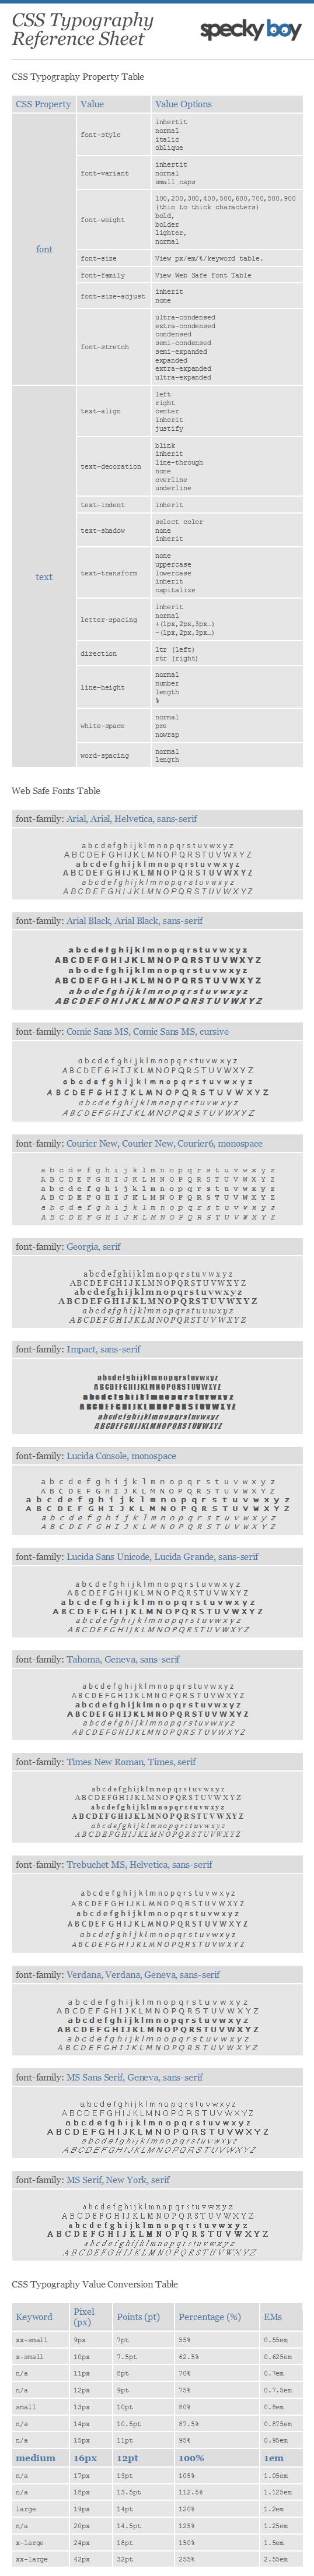 Css typography cheat sheet by speckyboy codigo pinterest css typography cheat sheet by speckyboy malvernweather Choice Image